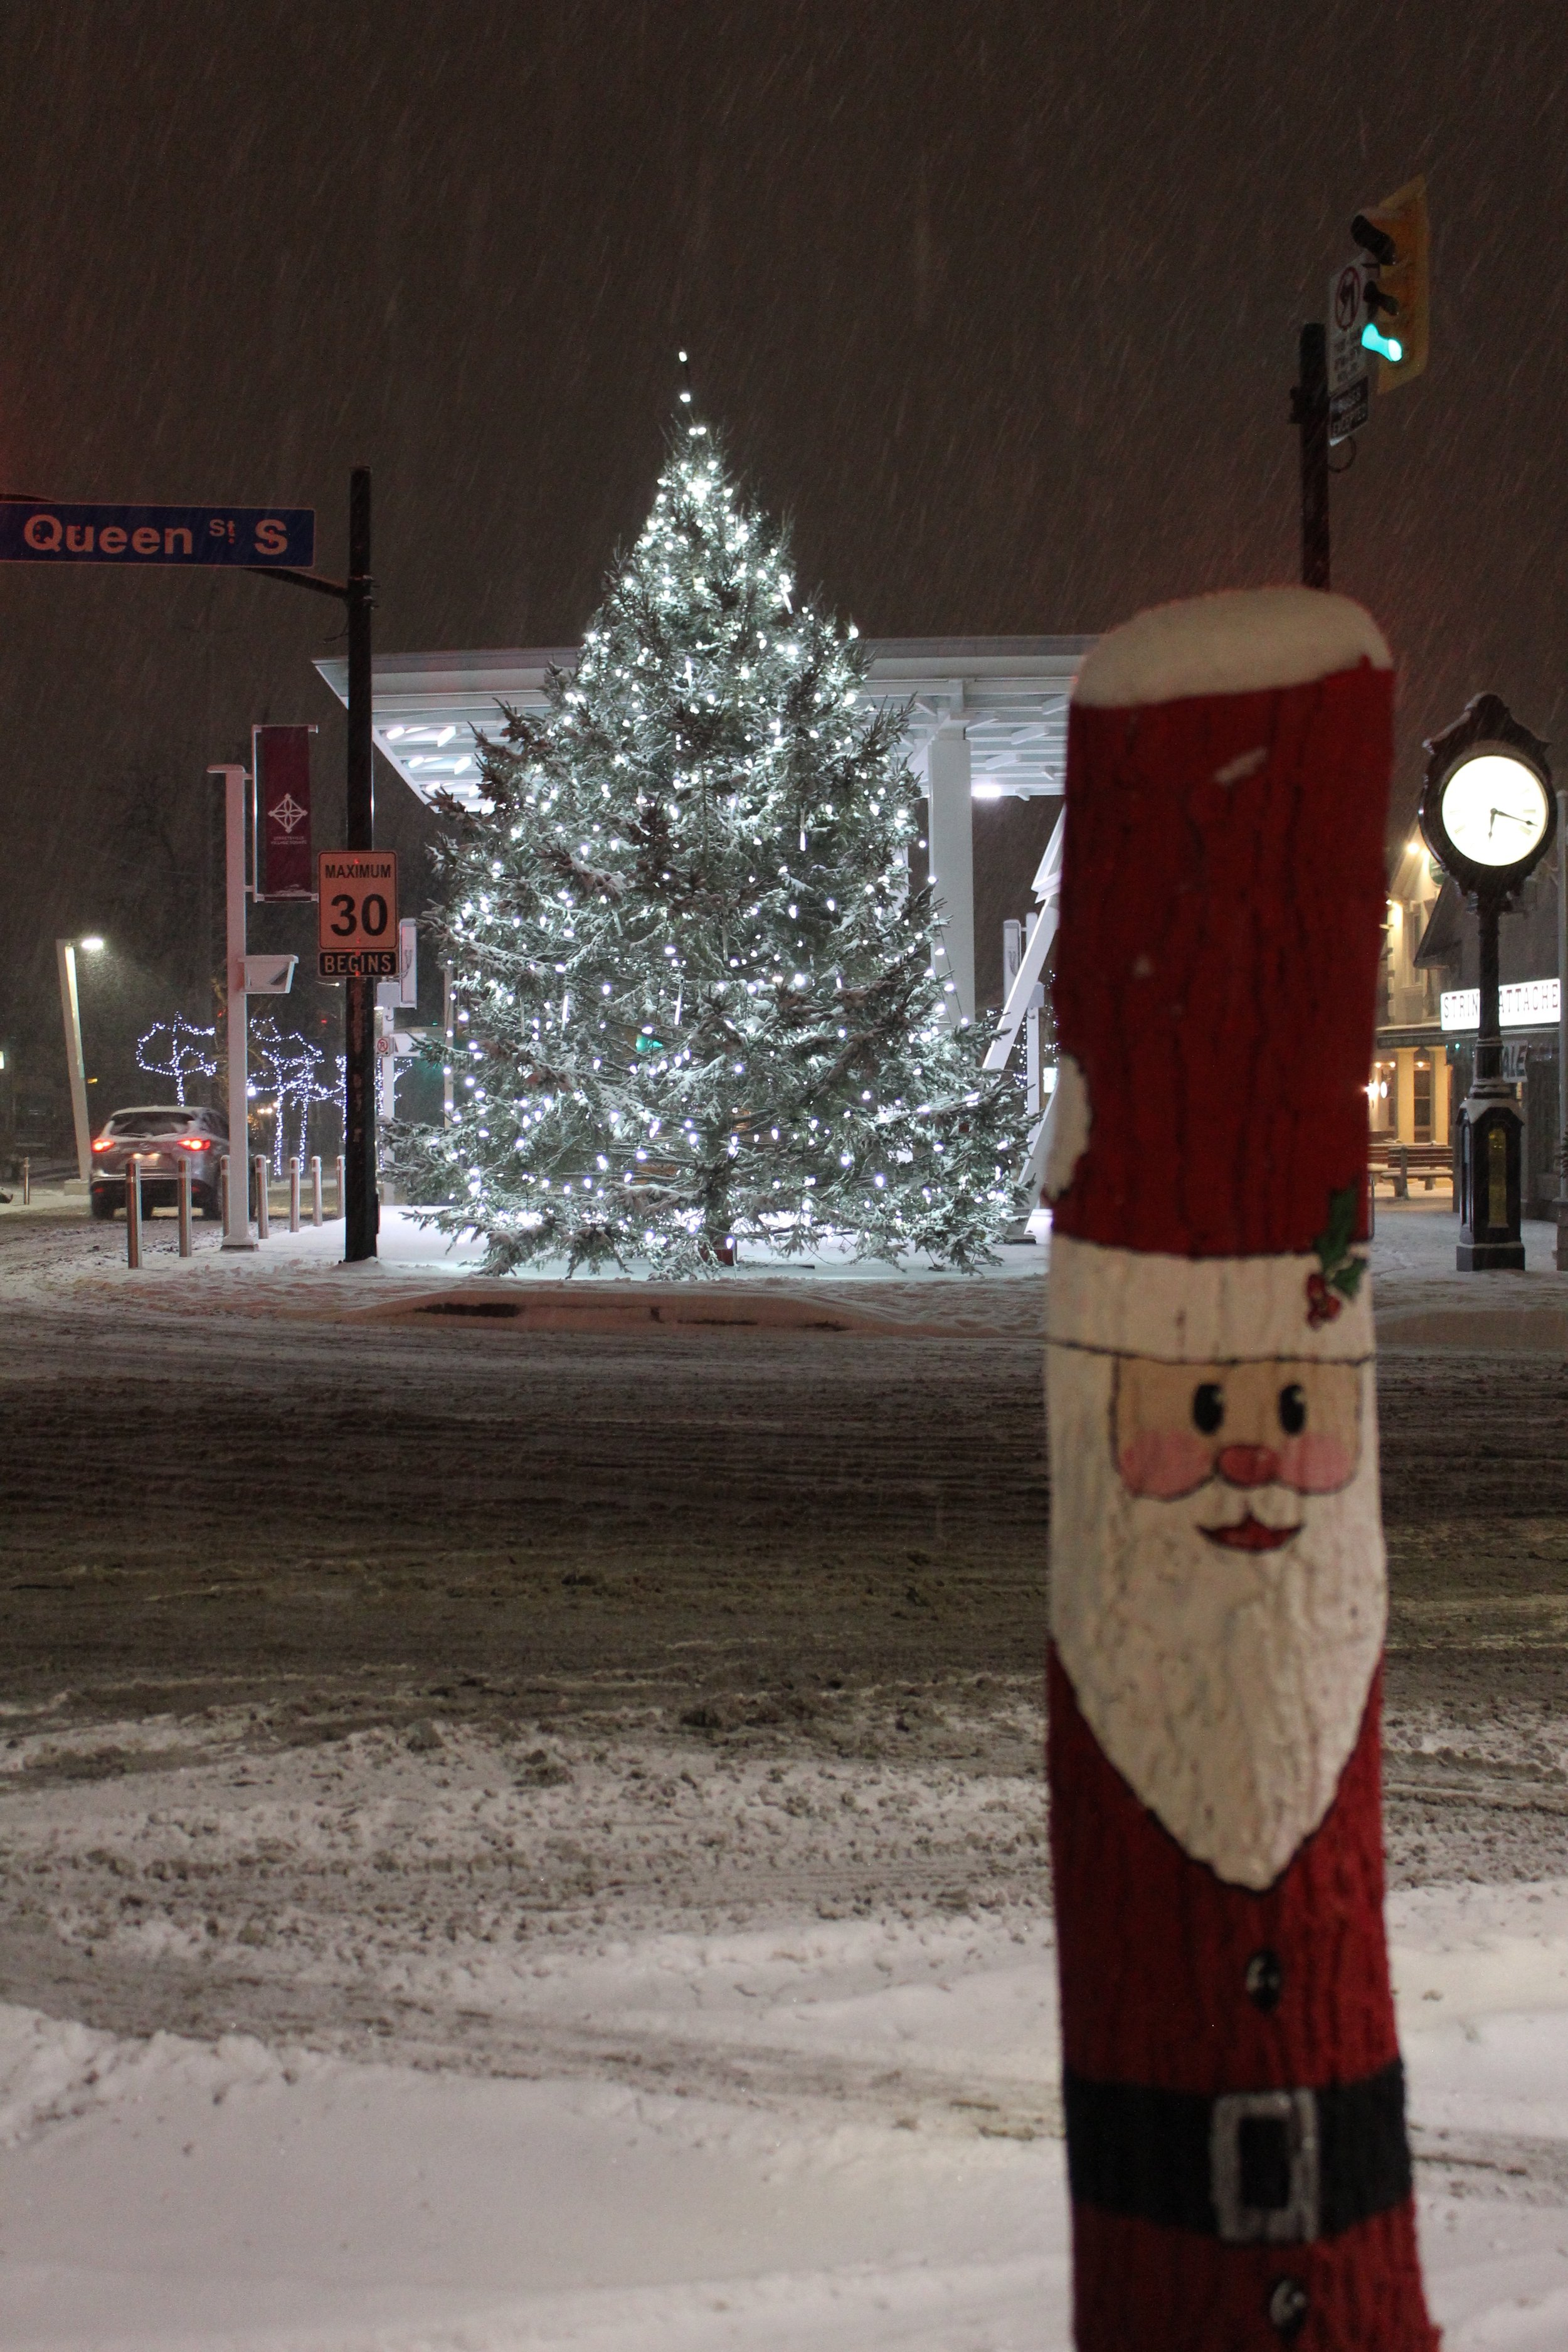 3_Streetsville Village Square 3.jpg